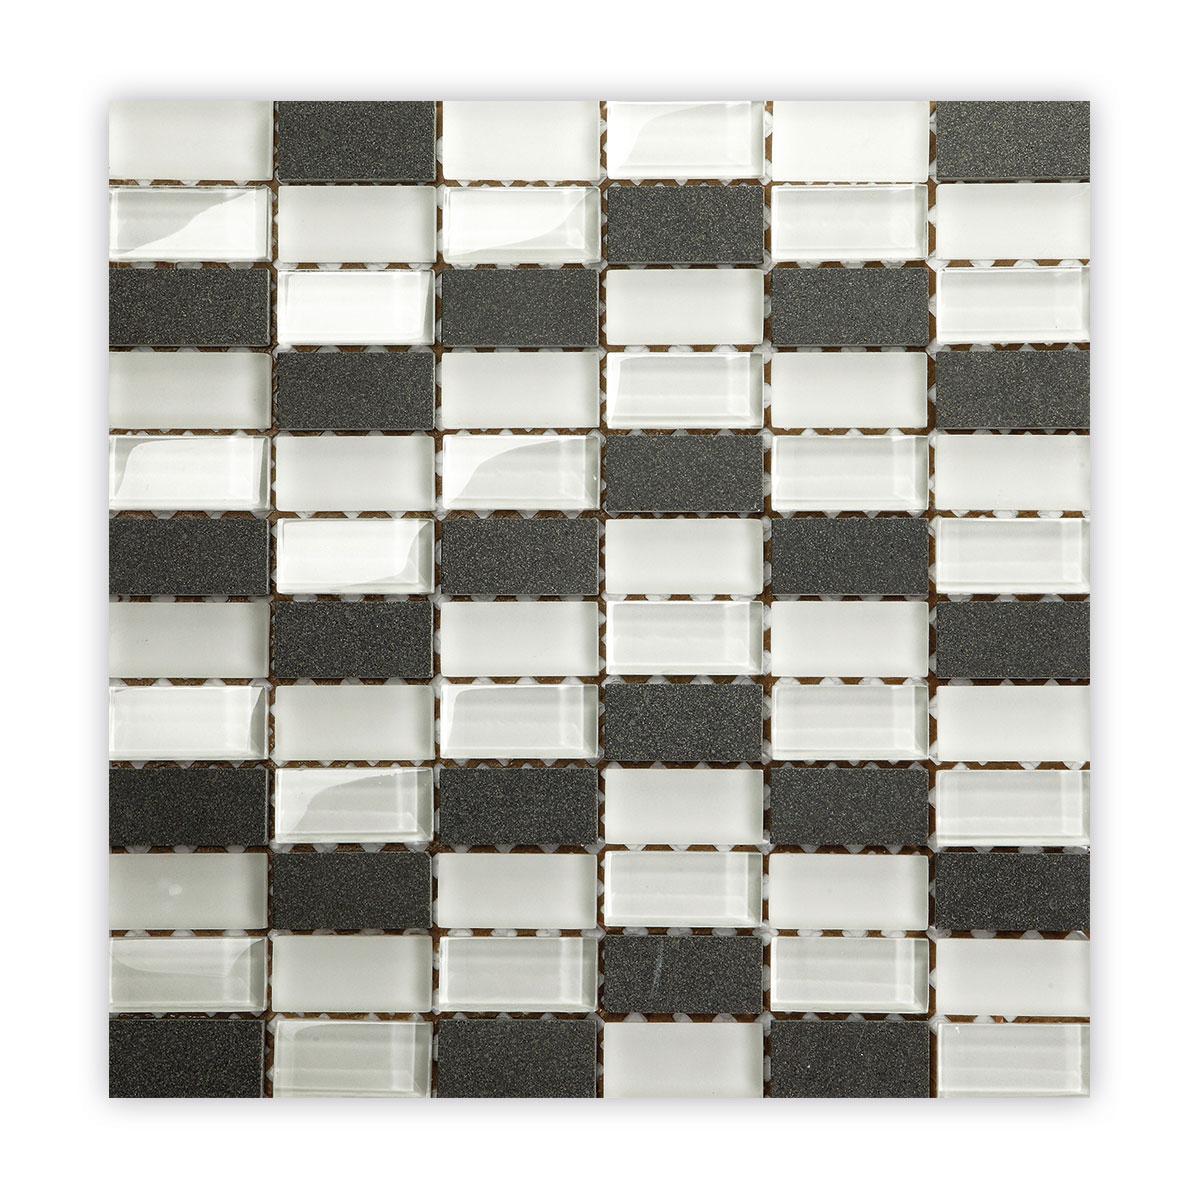 BASALTI grau weiß mix Image